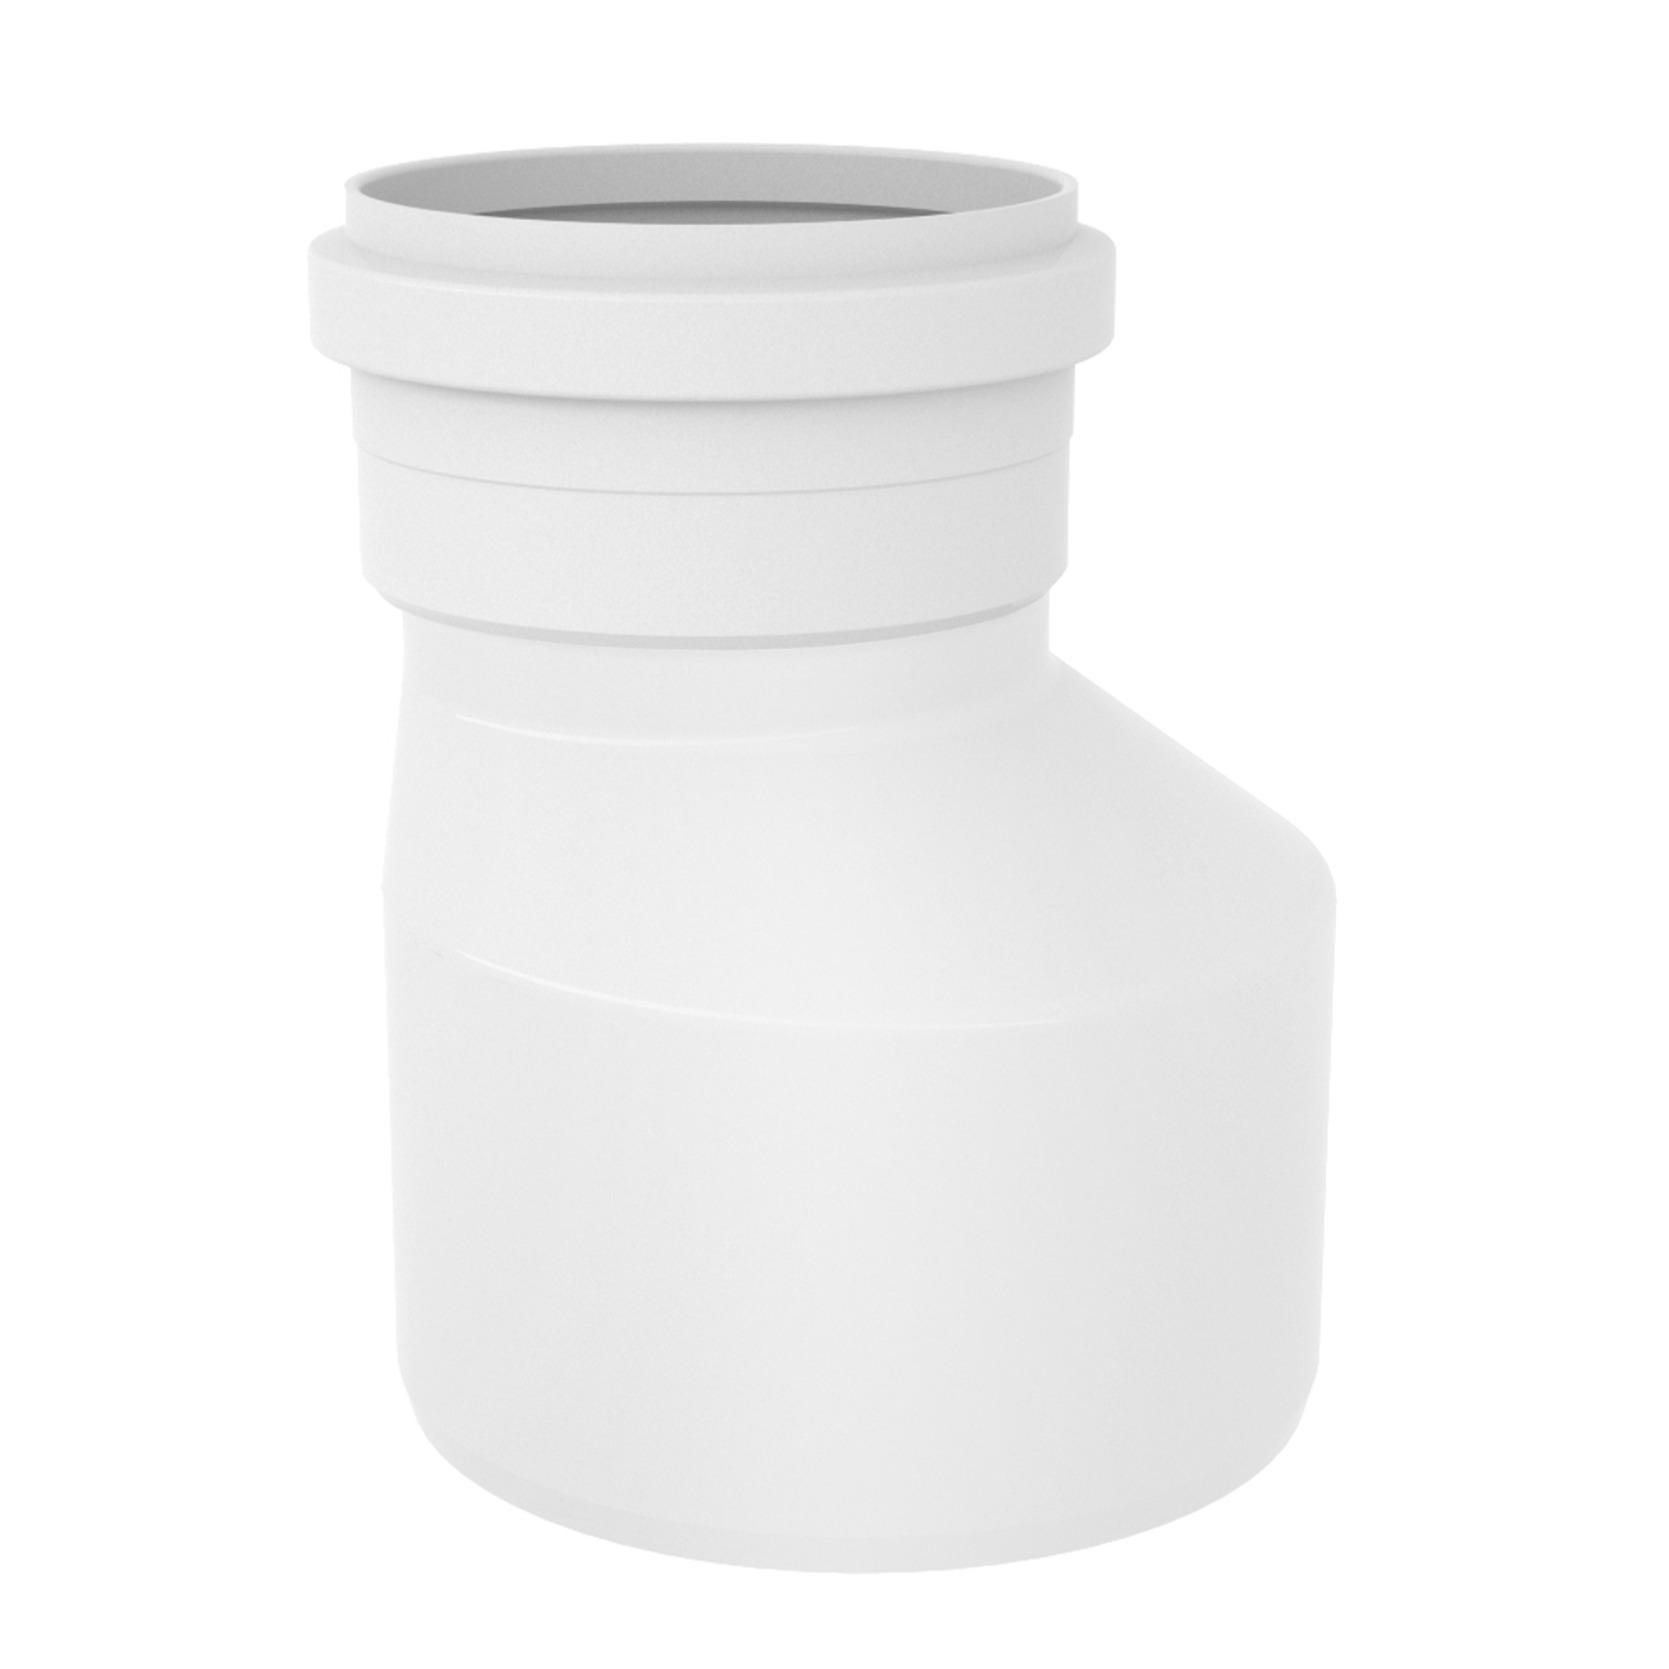 Reducao Excentrica para Esgoto PVC Branco 150 mm x 100 mm - Tigre